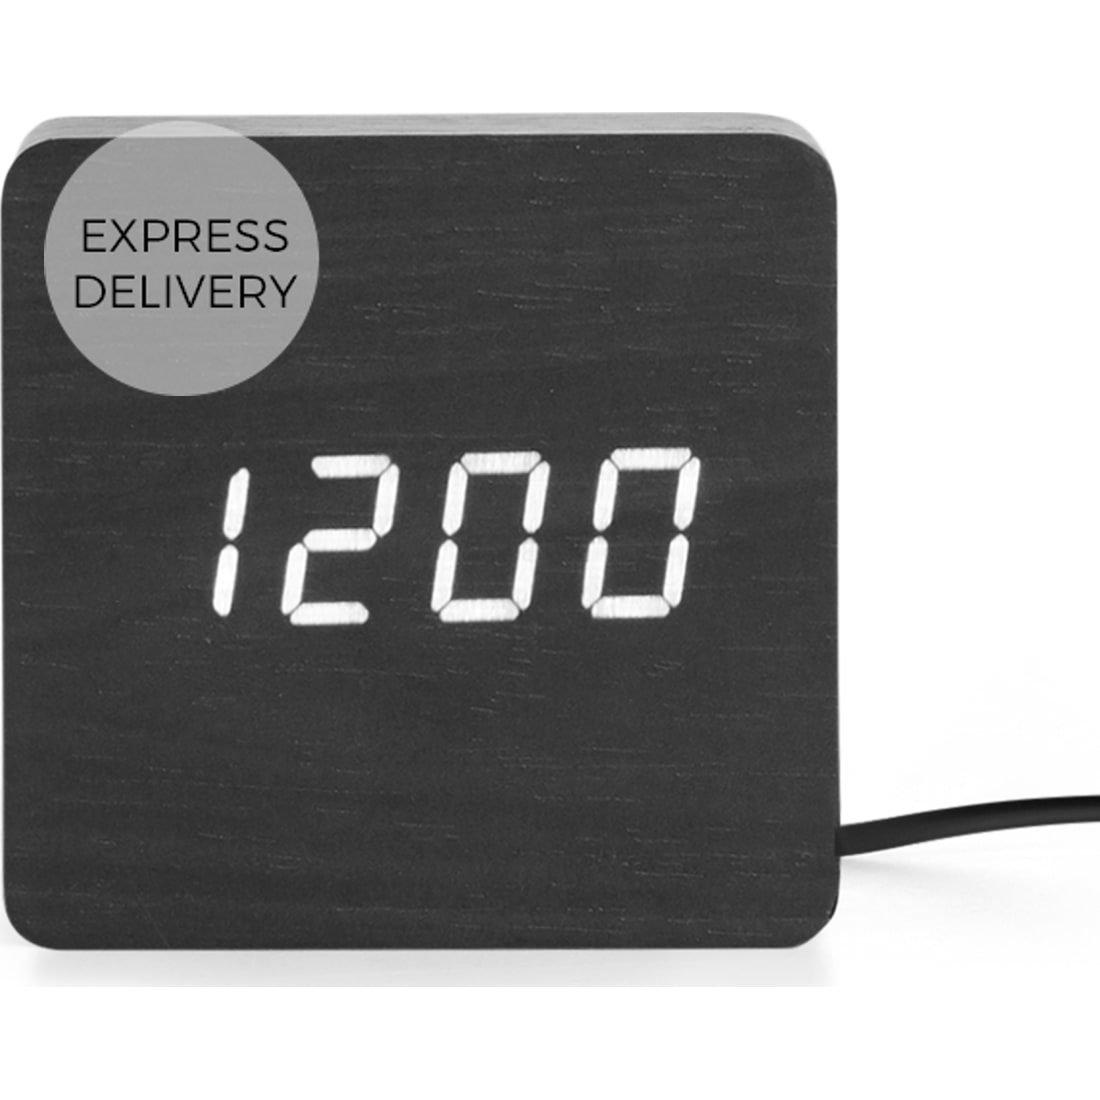 image-Odette Square Alarm Clock, Black